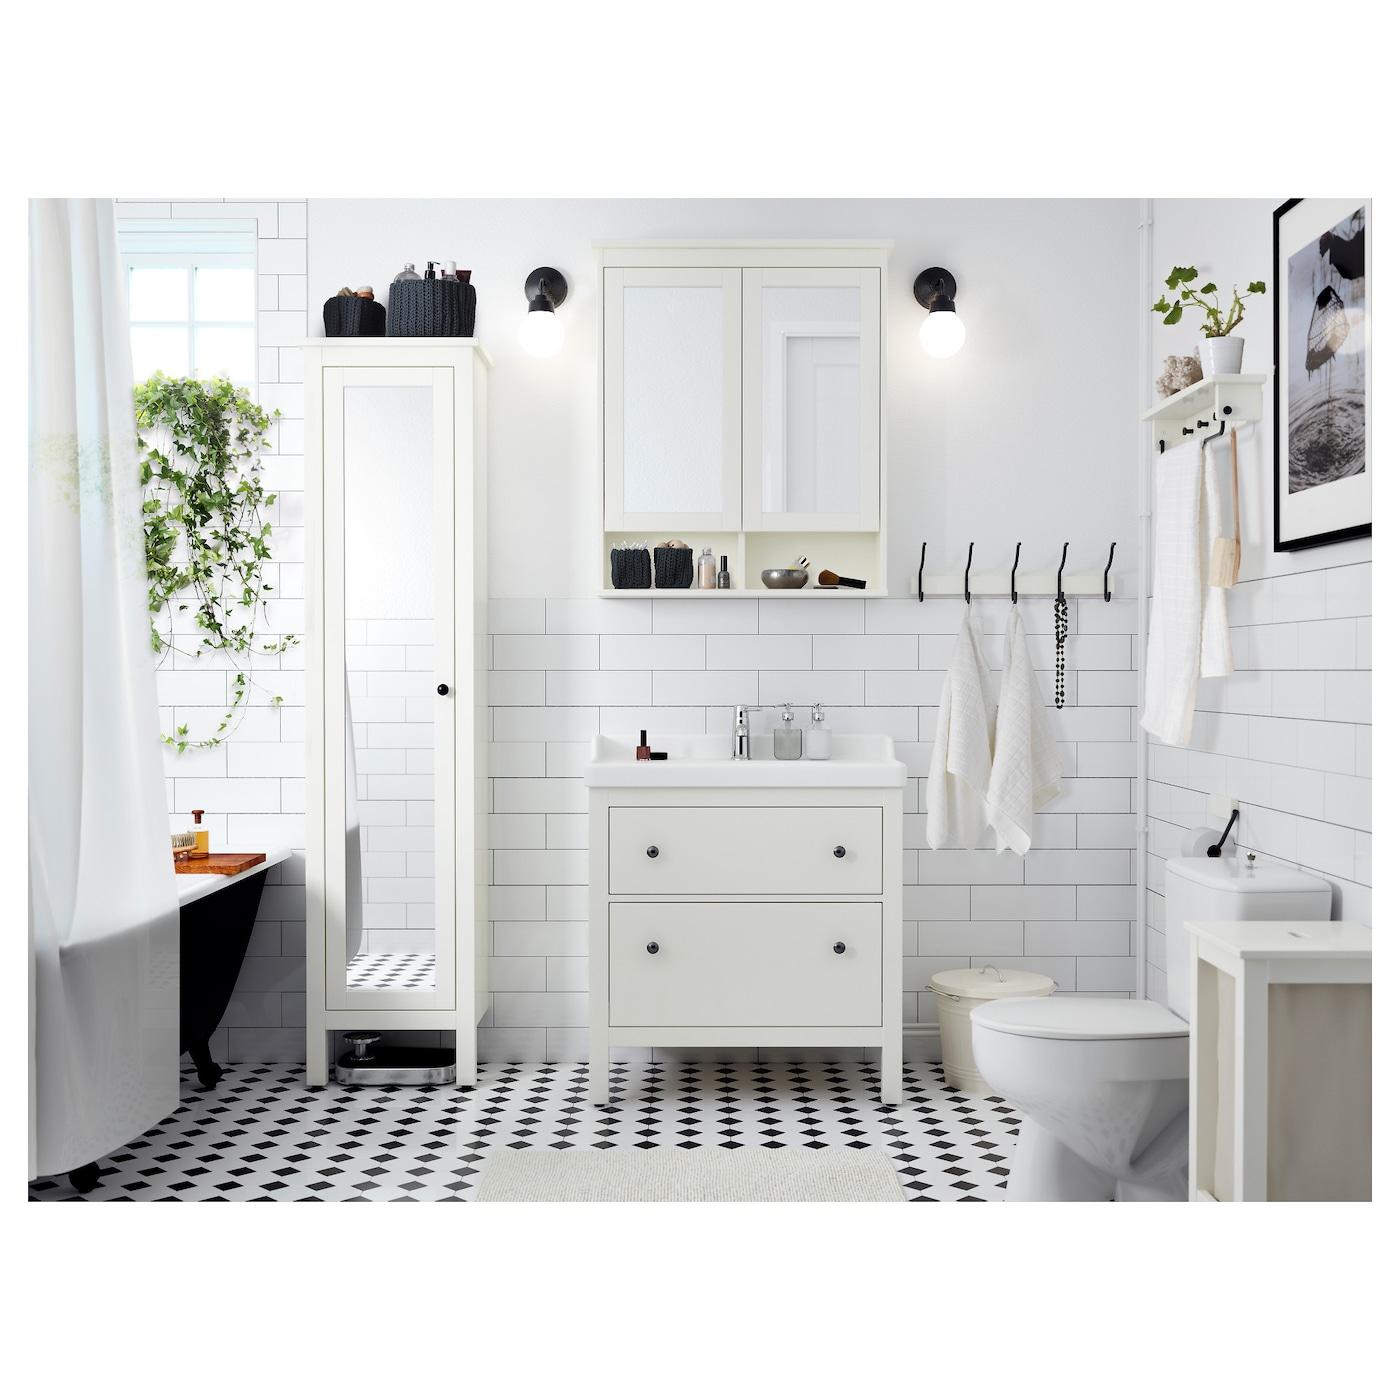 hemnes hoge kast met spiegeldeur wit 49x31x200 cm ikea. Black Bedroom Furniture Sets. Home Design Ideas